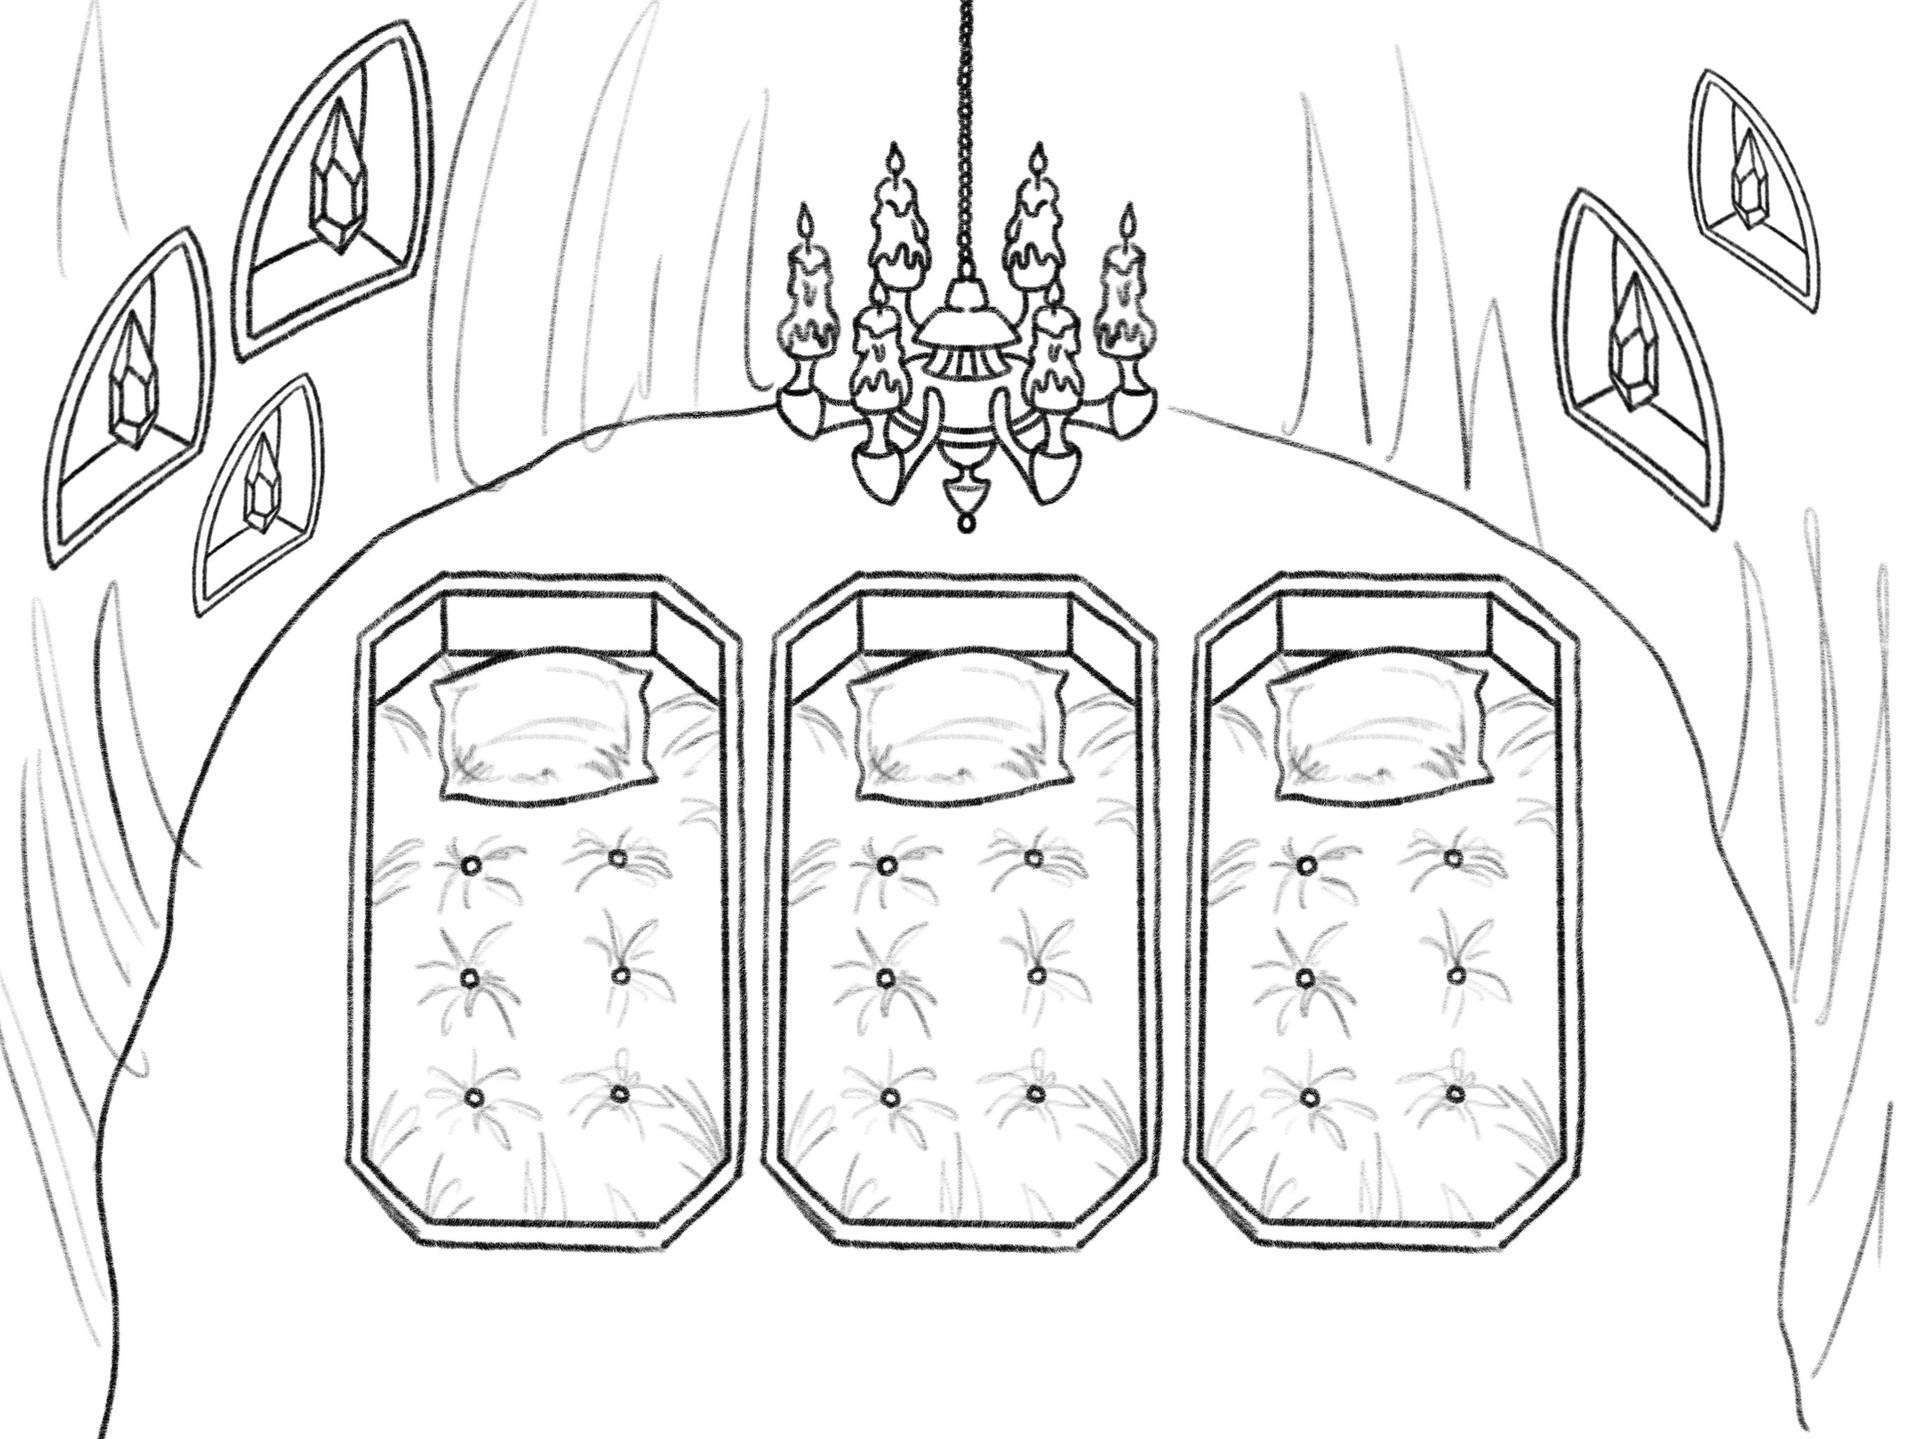 Brett stebbins vampire house sleeping chamber 01